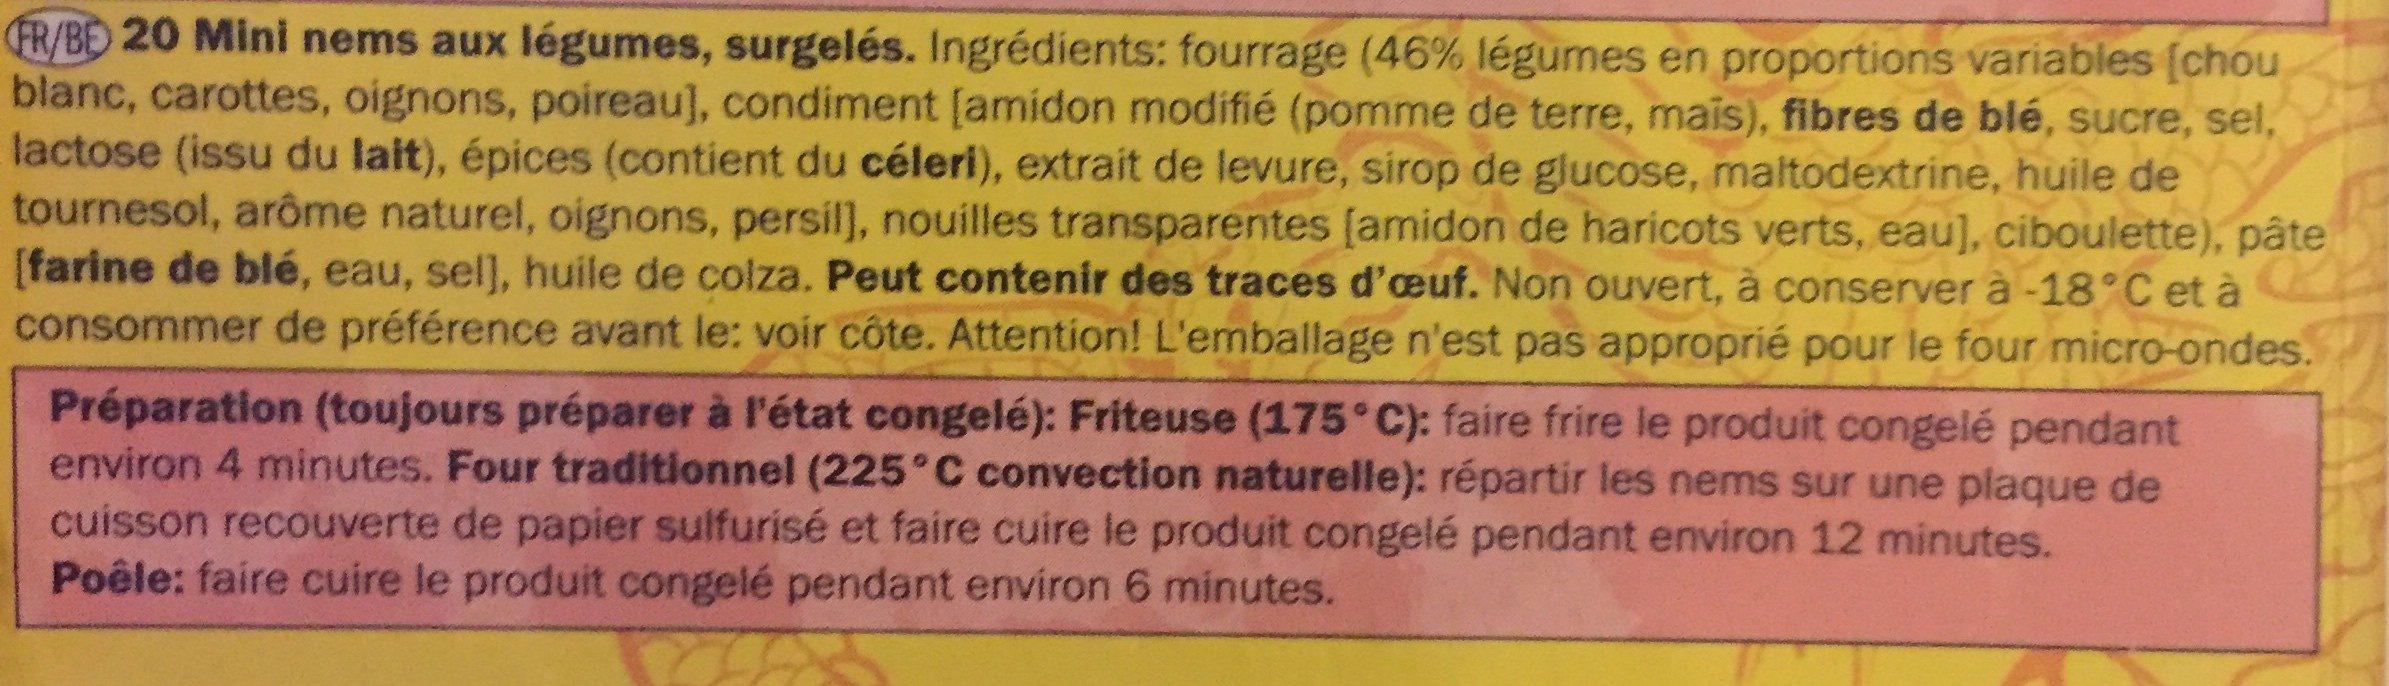 20 Mini-frühlingsrollen Mit Gemüse - Culinea - 400G - Ingrédients - fr